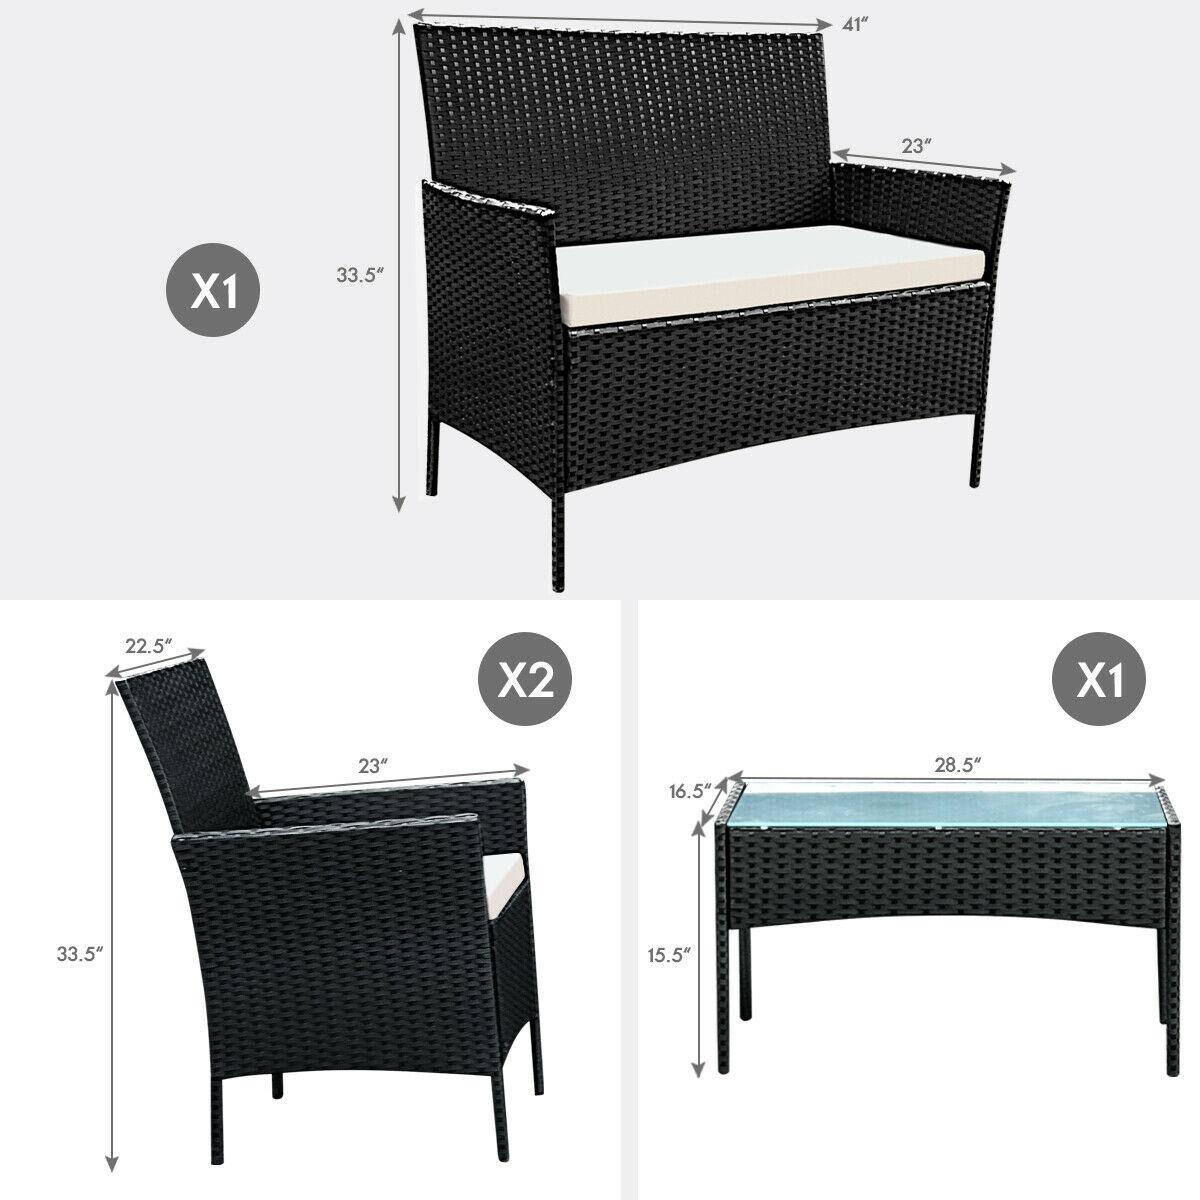 4pcs Patio Rattan Sofa Set Loveseat Cushioned Furniture Outdoor Garden - image 3 of 9